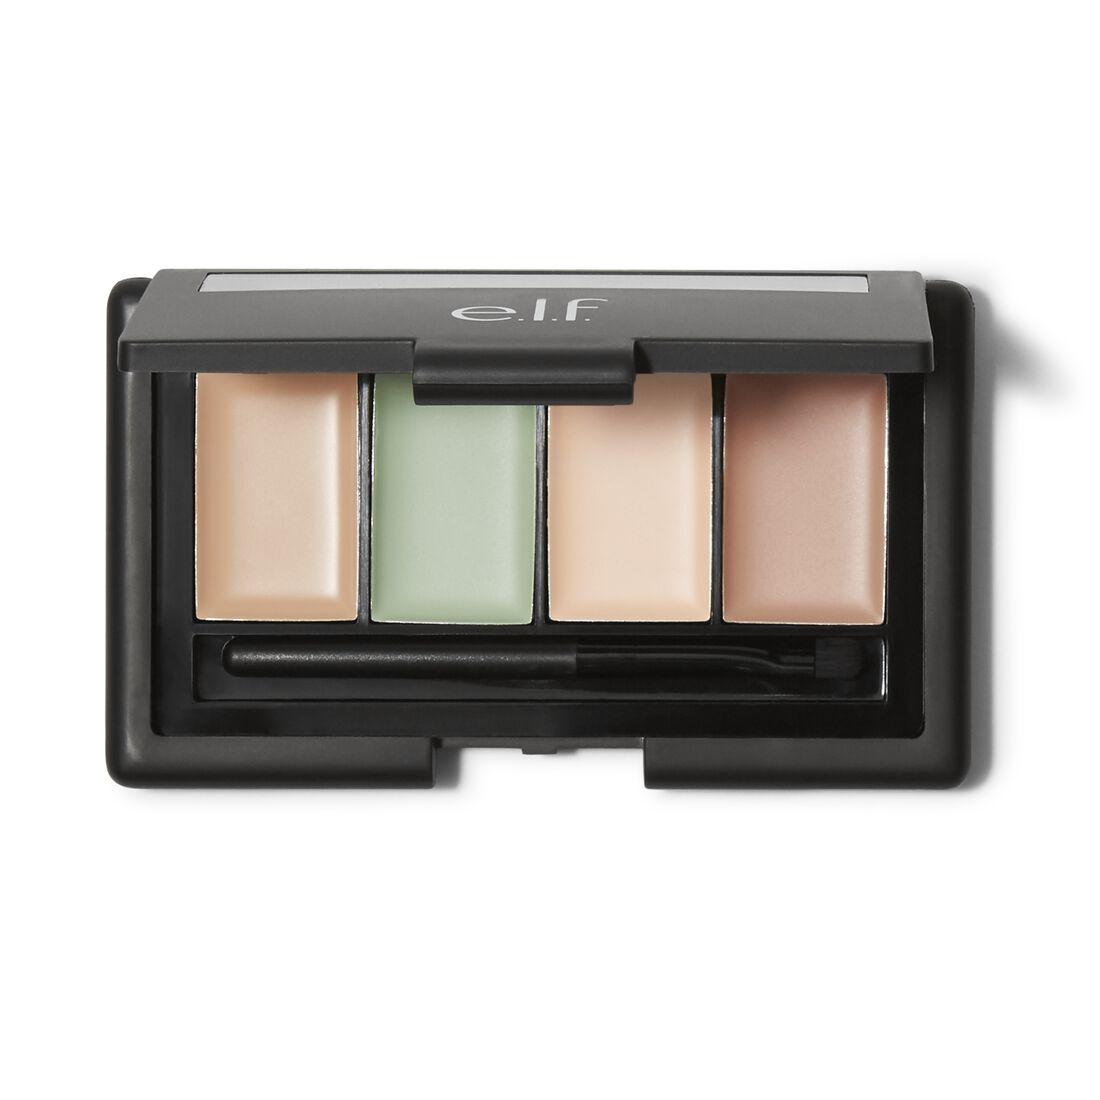 E.l.f Cosmetics - Corrective Concealer